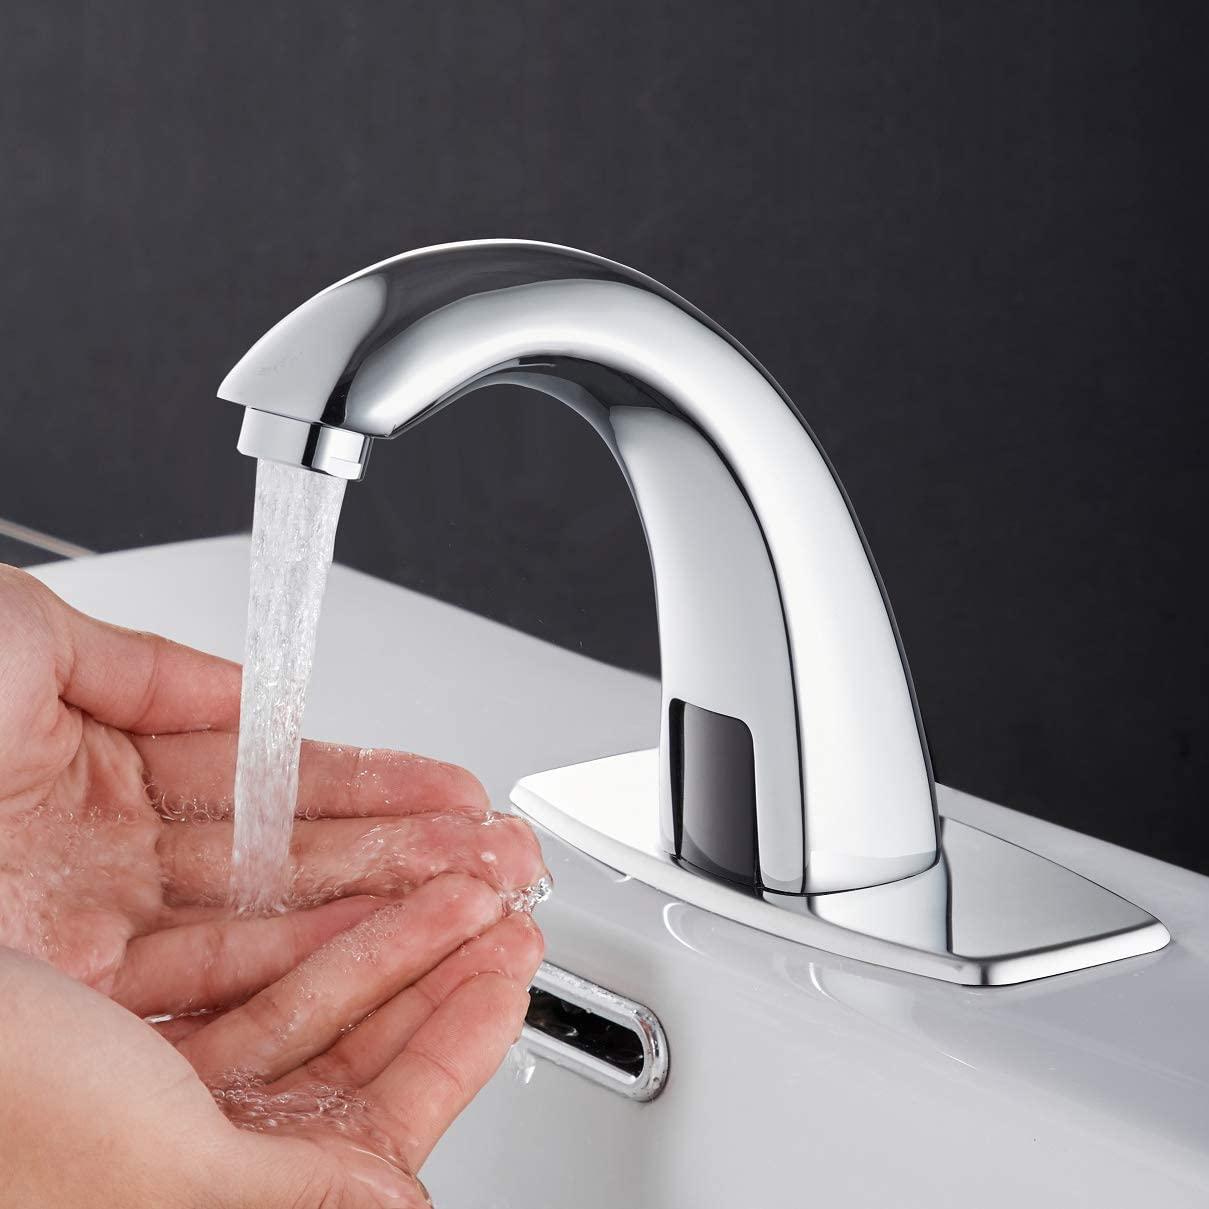 Sensor-sink-faucet Best +60 Ideas to Enhance Your Bathroom's Luxuriousness